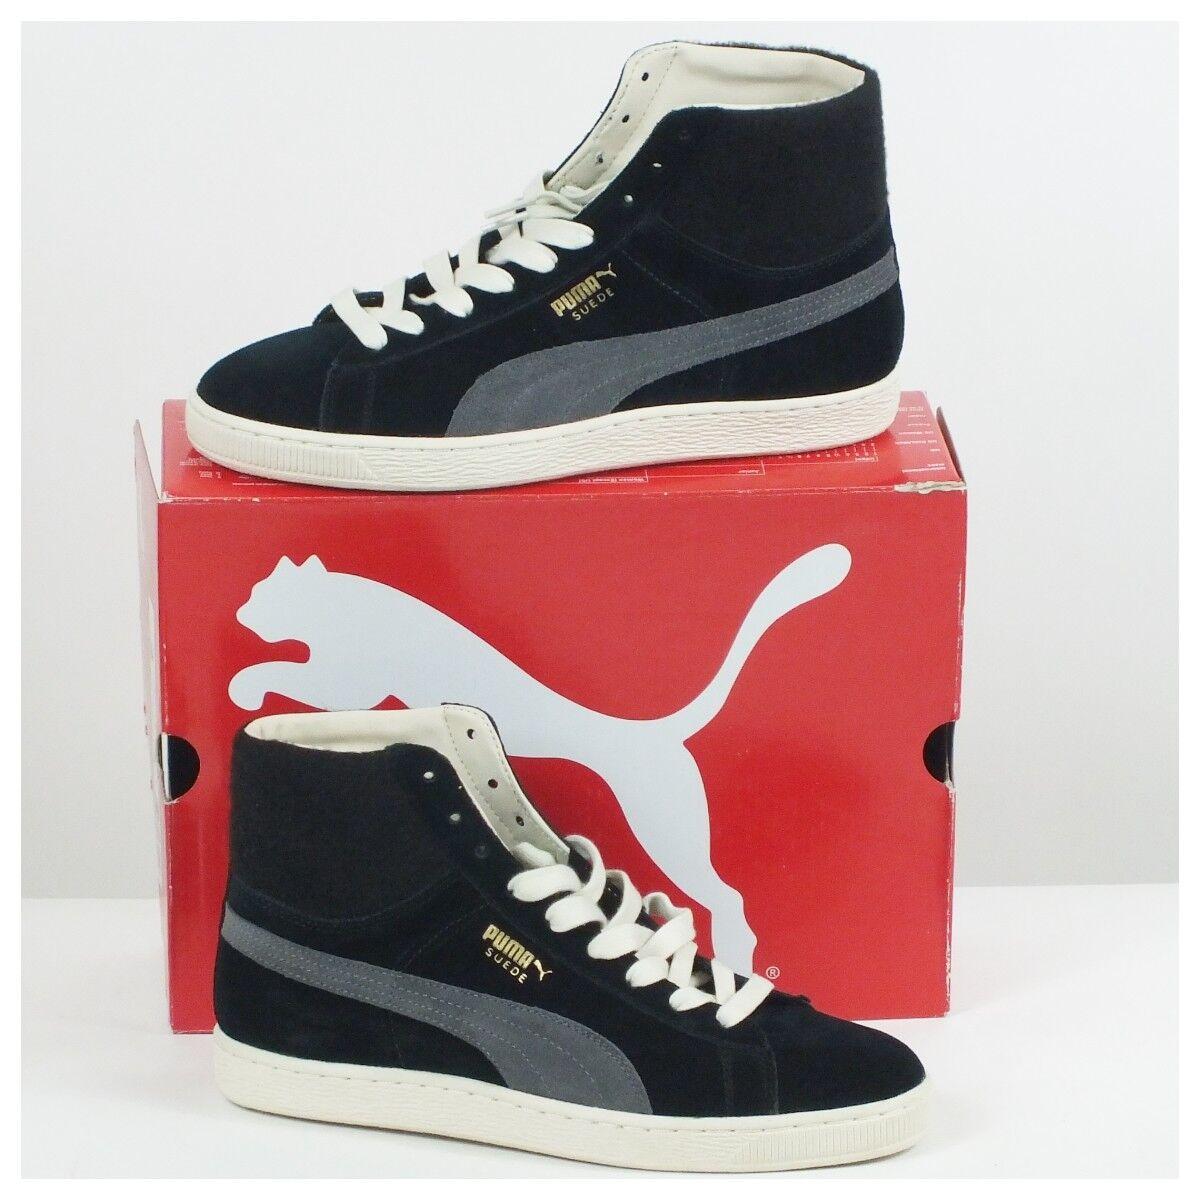 Puma Men's Suede Mid City Black Dark Shadow Sneker Shoe Size 9.5 M